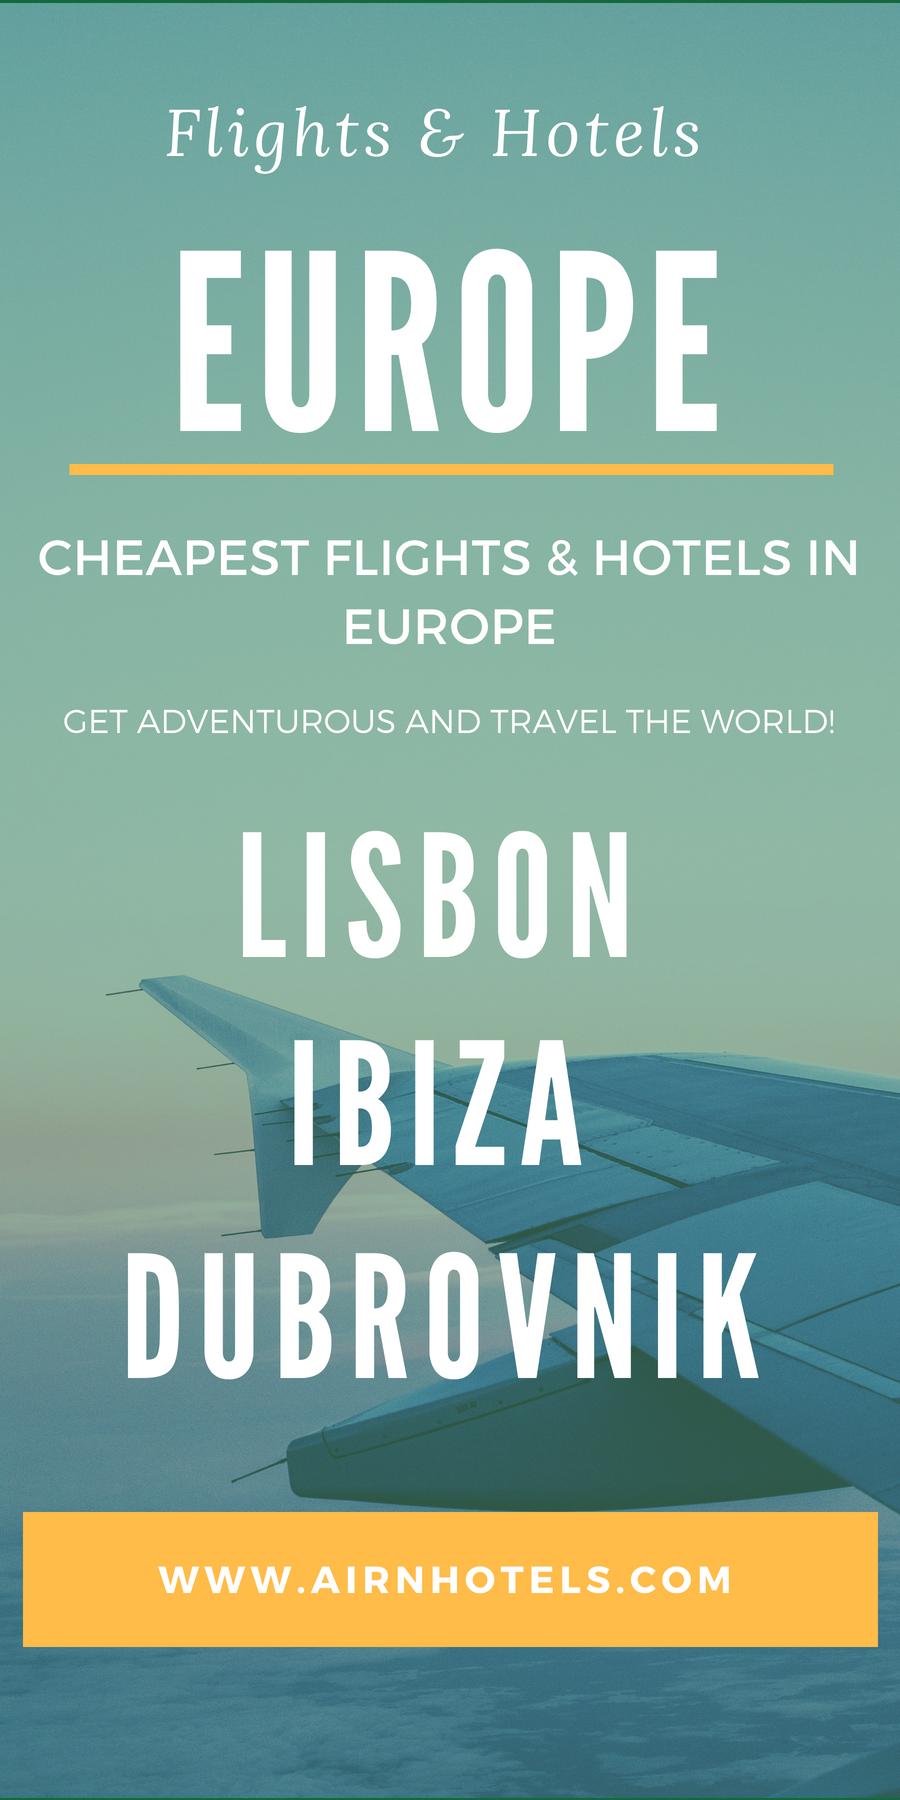 Cheapest Flights To Europe Travel Lisbon Lisbon Travel Travel Ibiza Ibiza Travel Travel Dubrovnik Cheap Flights To Europe Cheap Flights Ibiza Travel